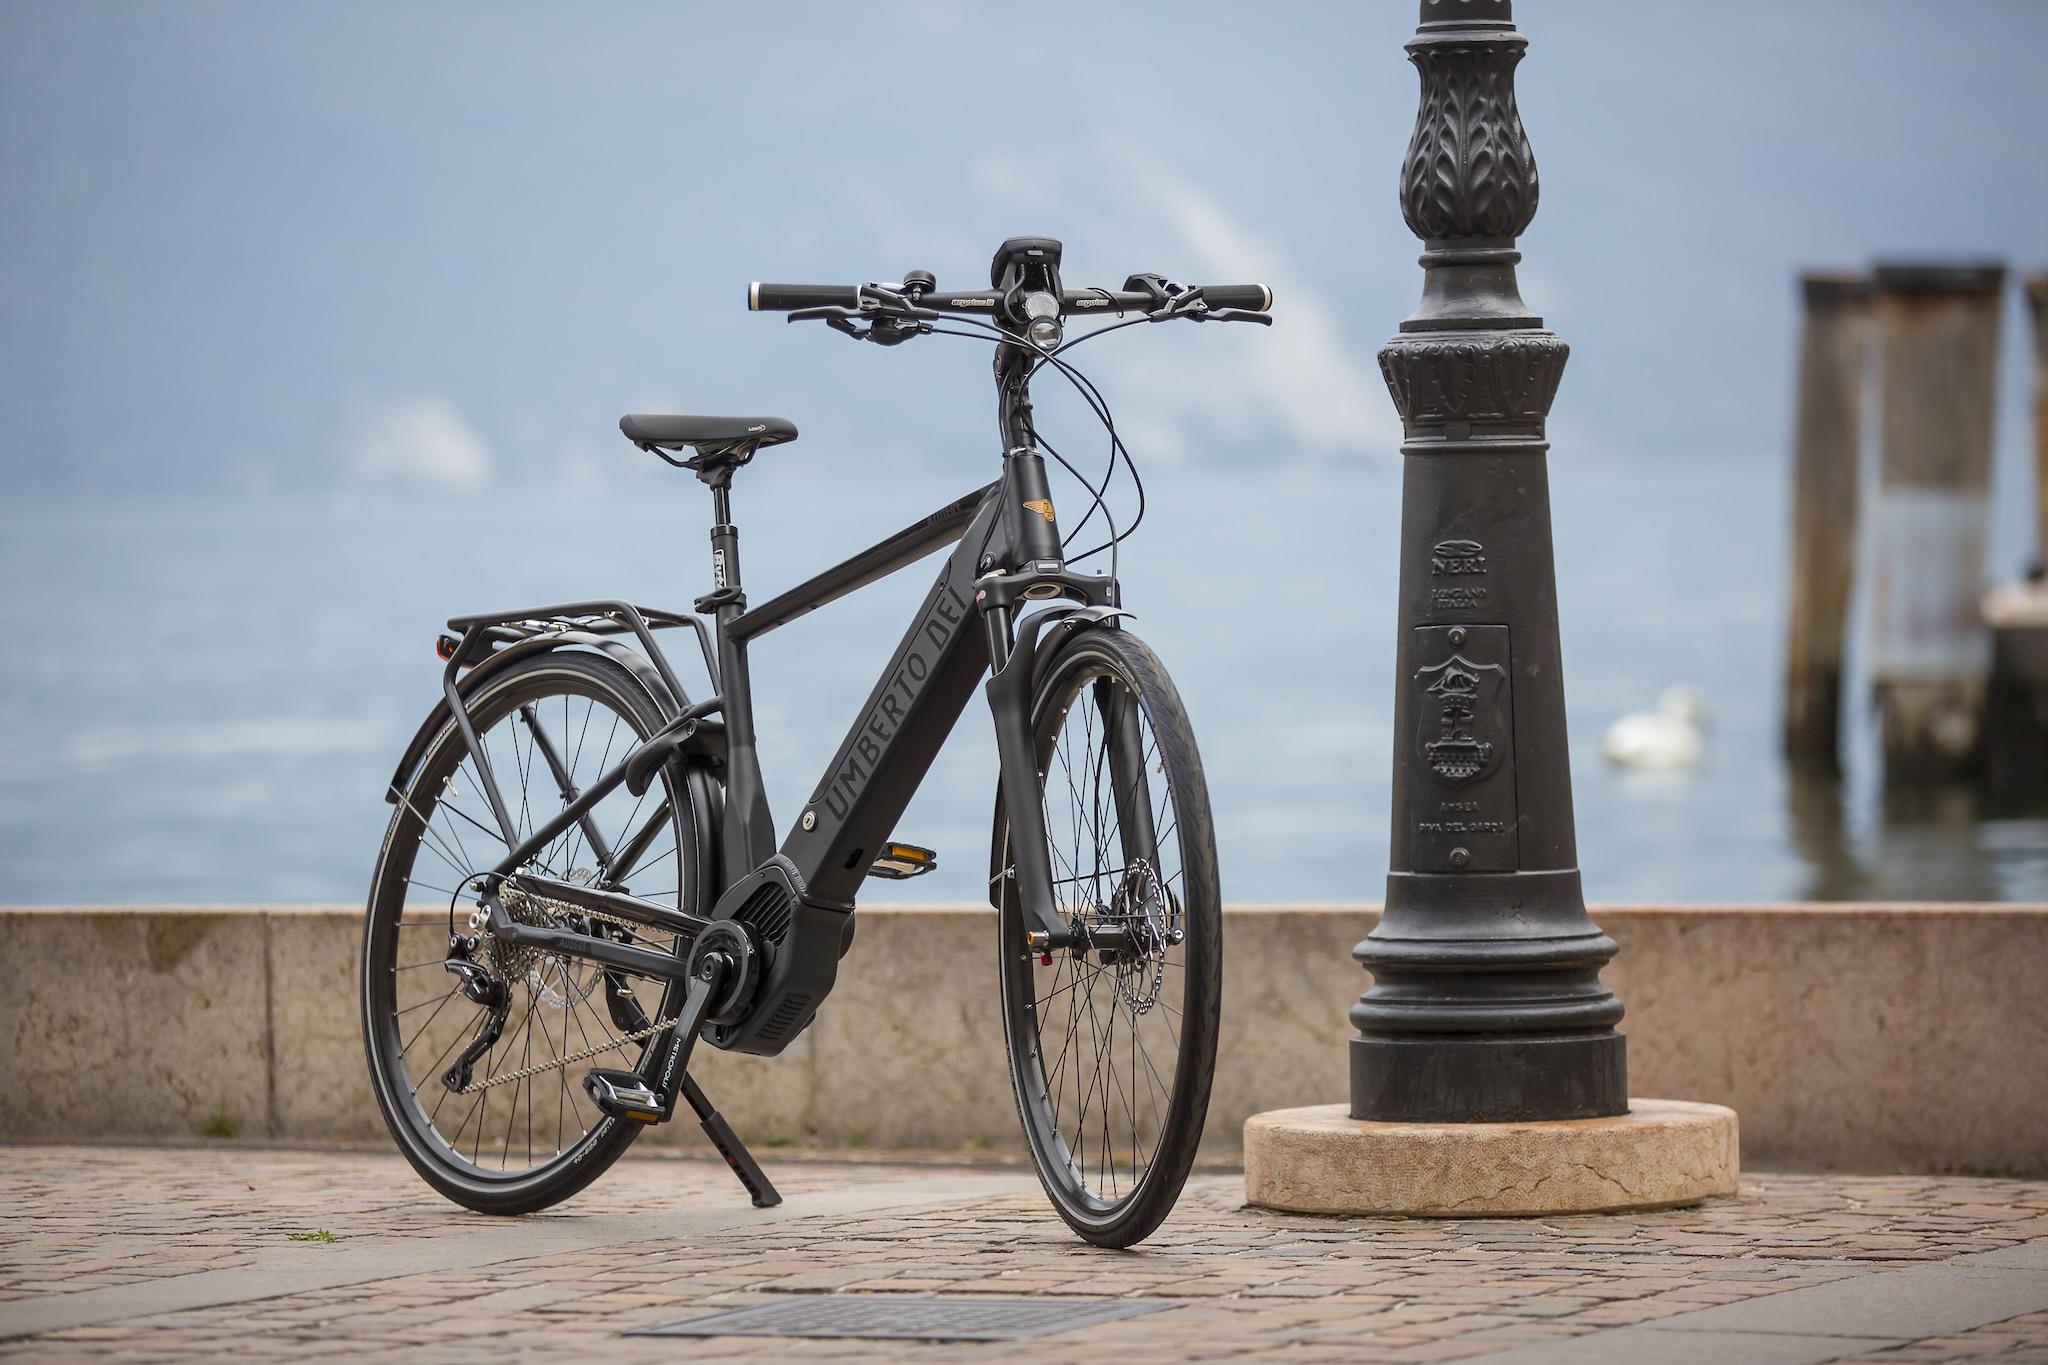 Bicicletta Umberto Dei Usata